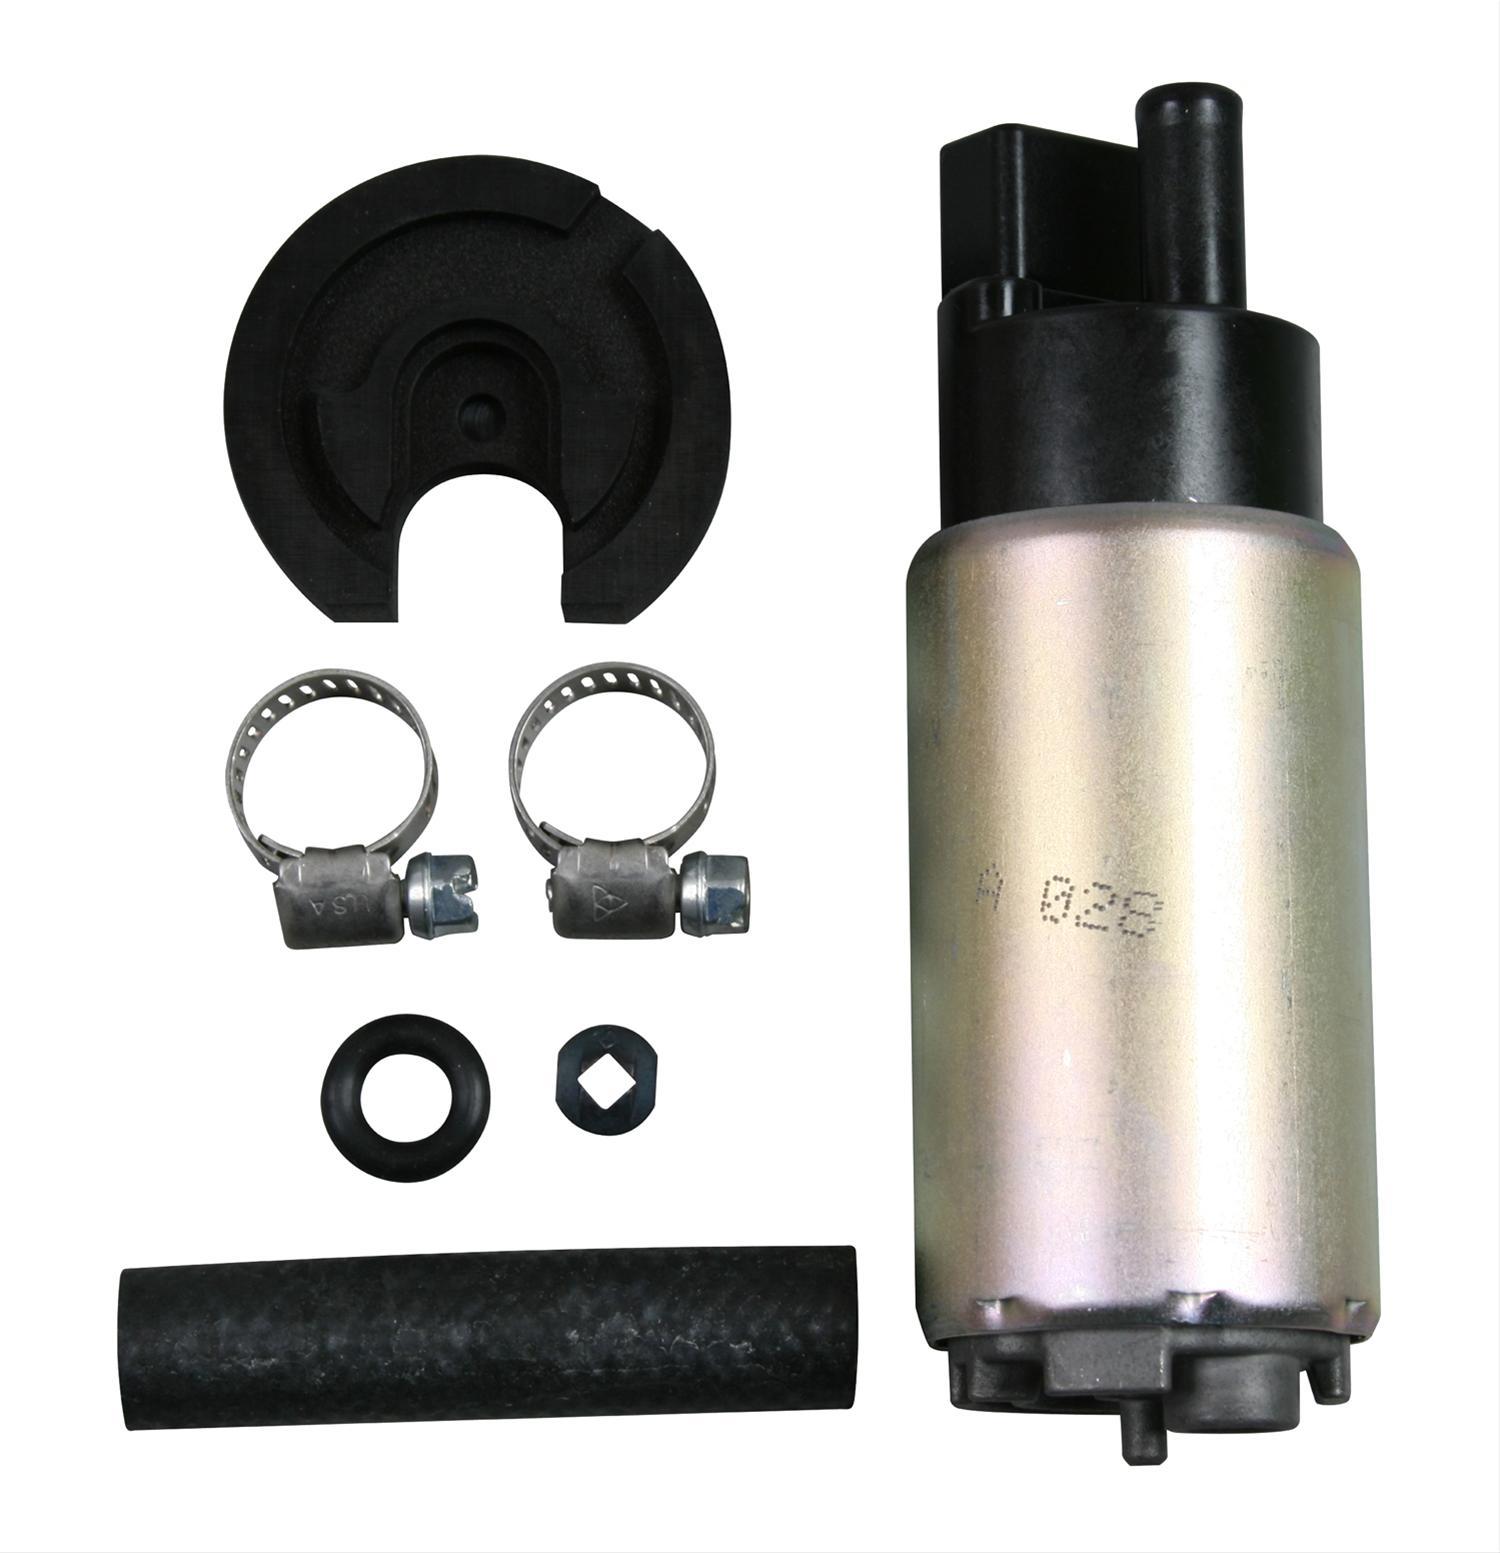 2000 Nissan Altima Fuel Pump